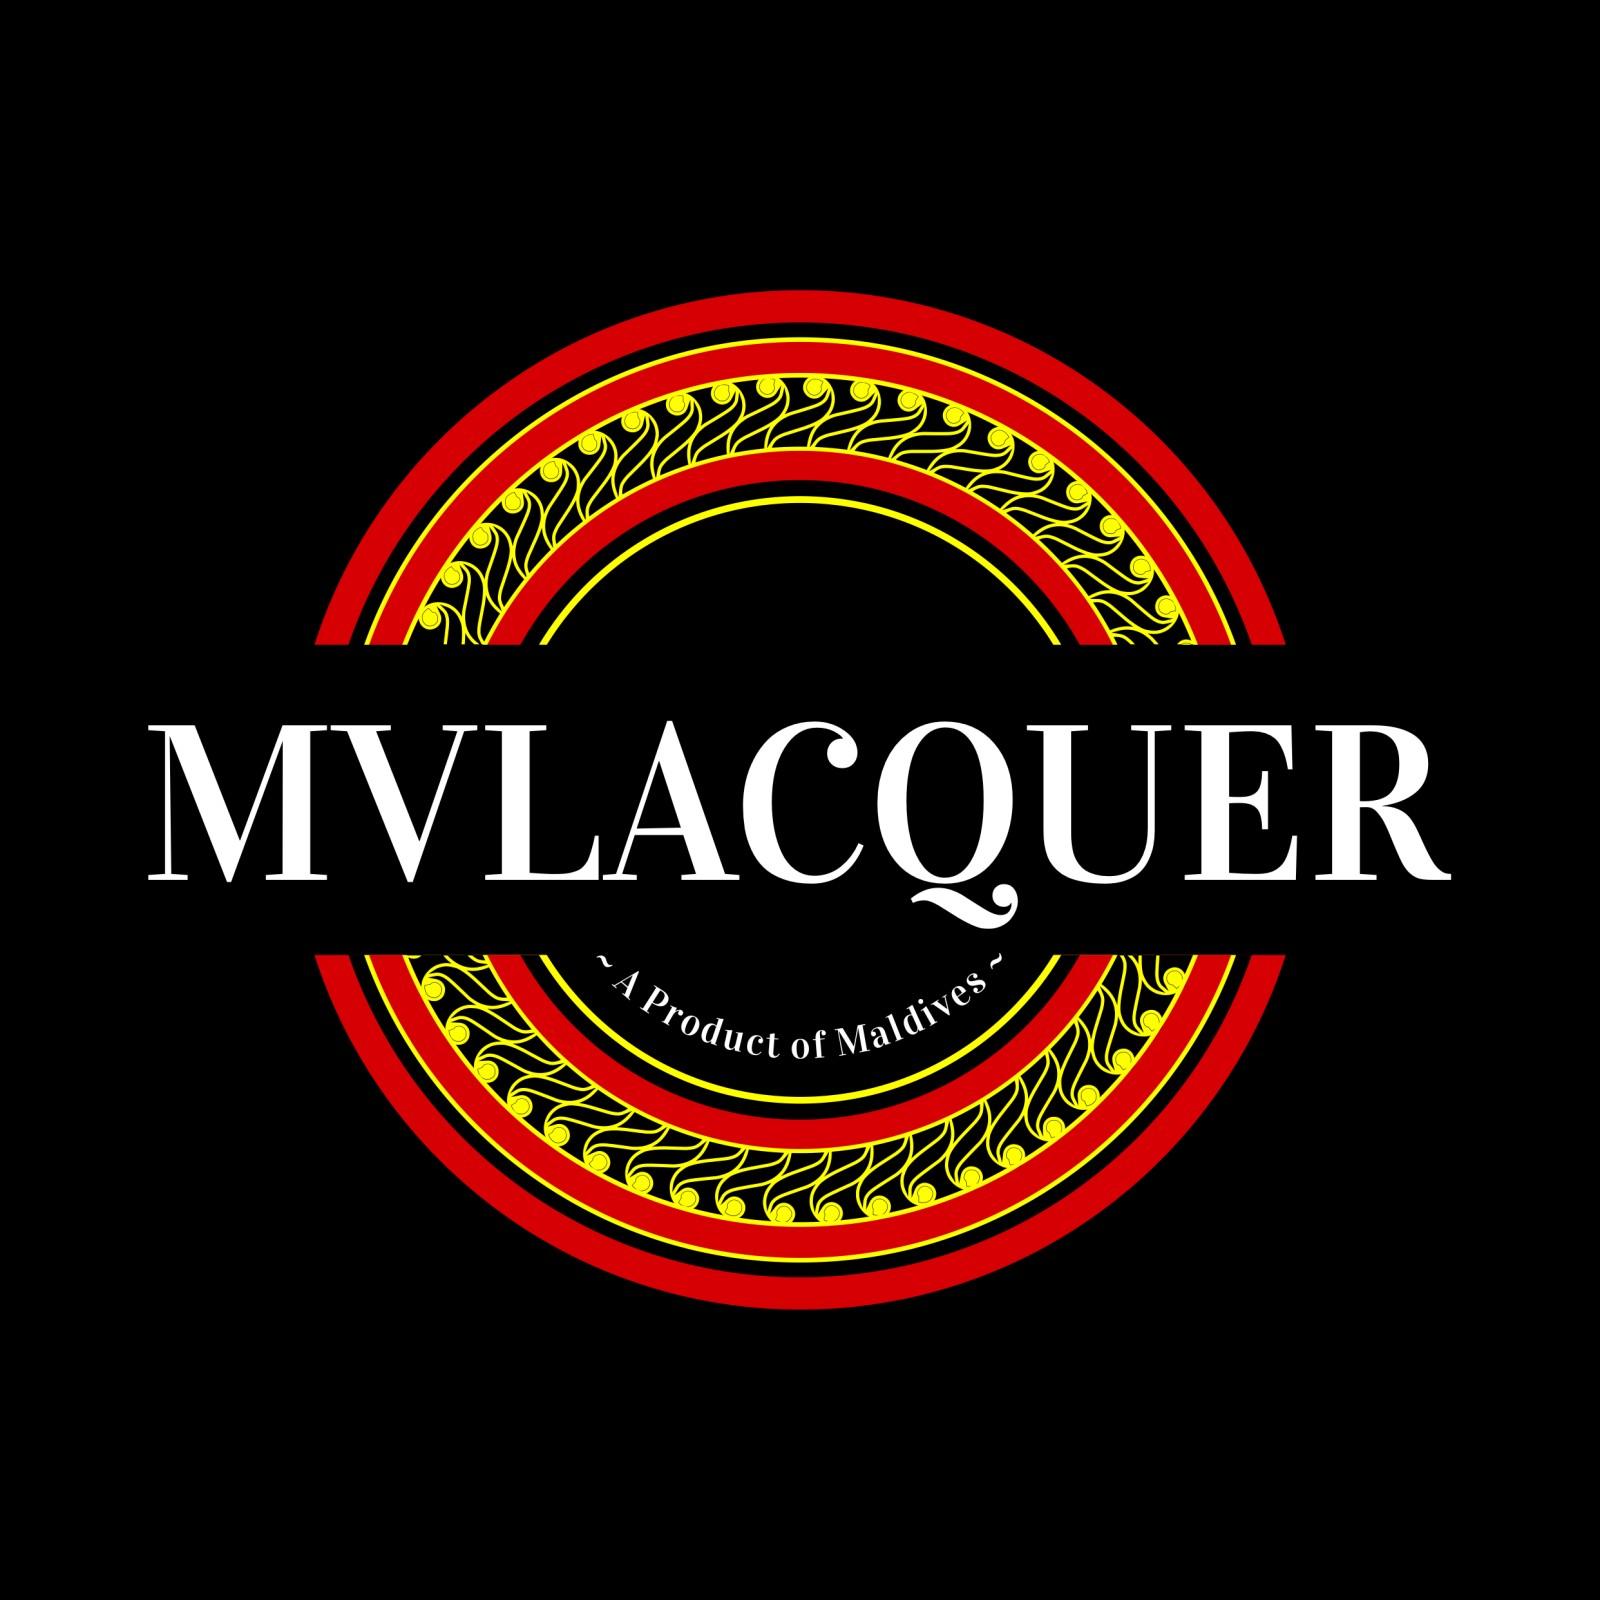 MVLacquer